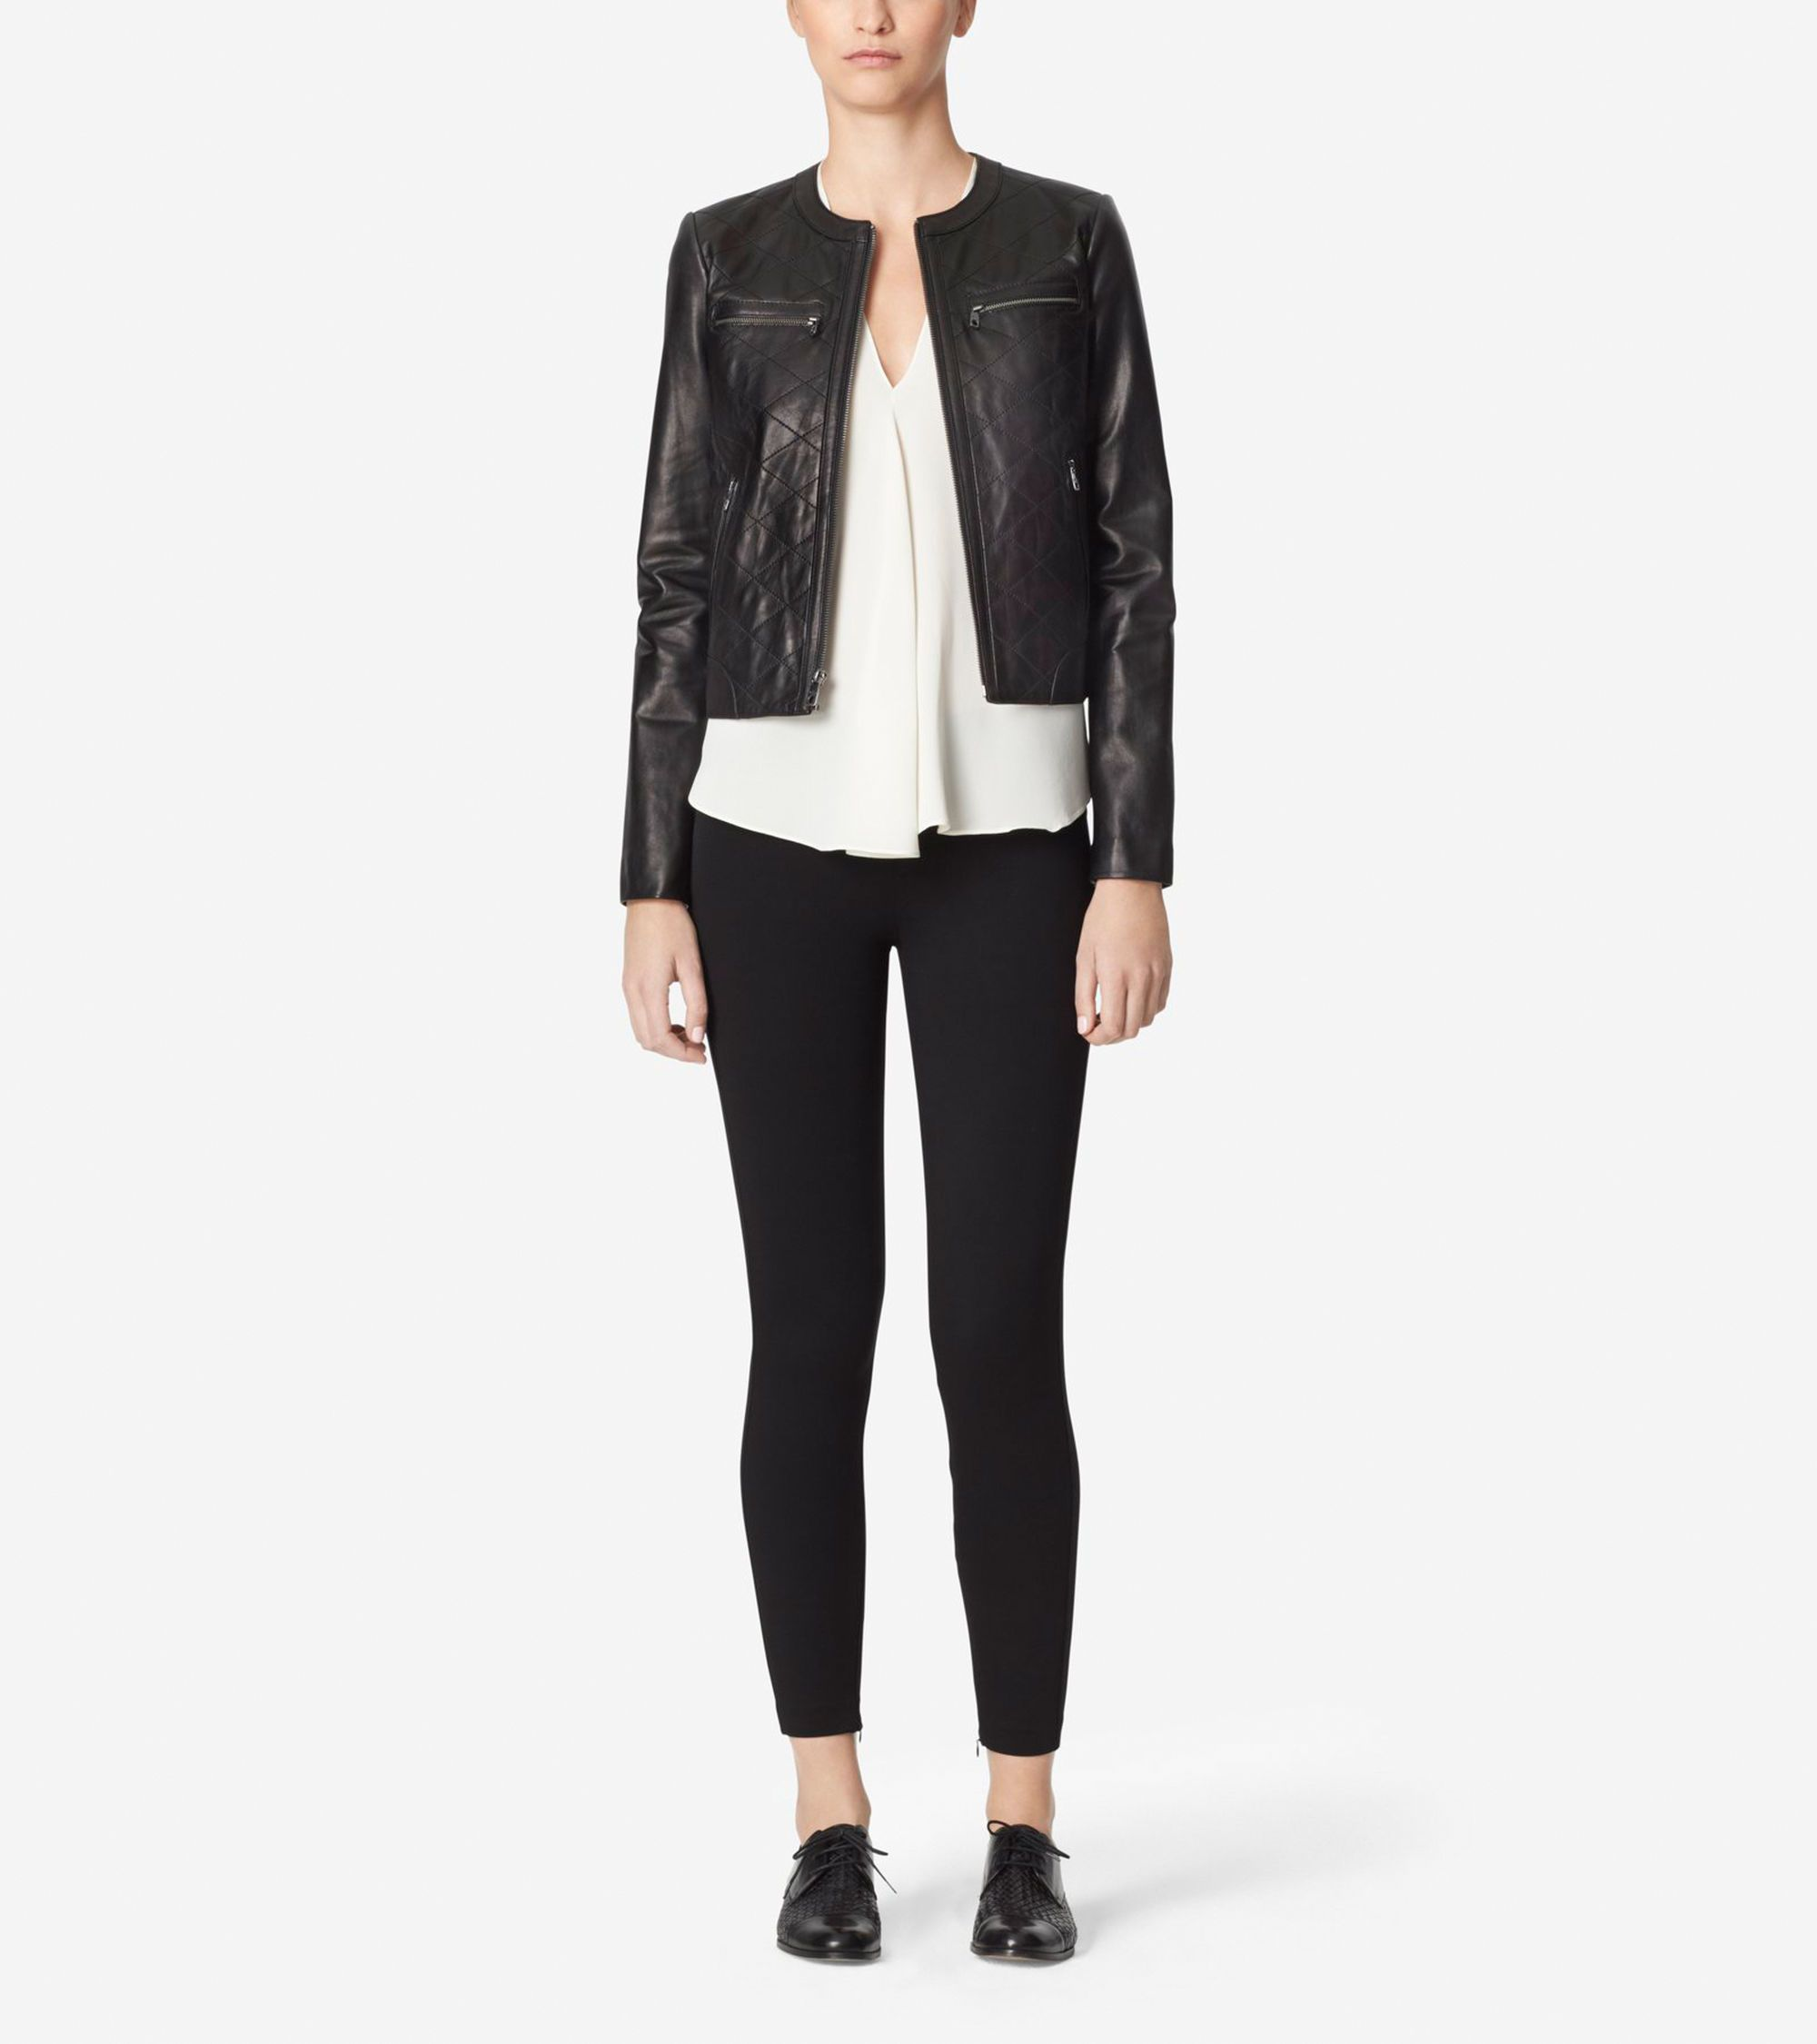 Collarless Leather Jacket Collarless Leather Jacket Women Outerwear Jacket Leather Jacket [ 2250 x 2000 Pixel ]